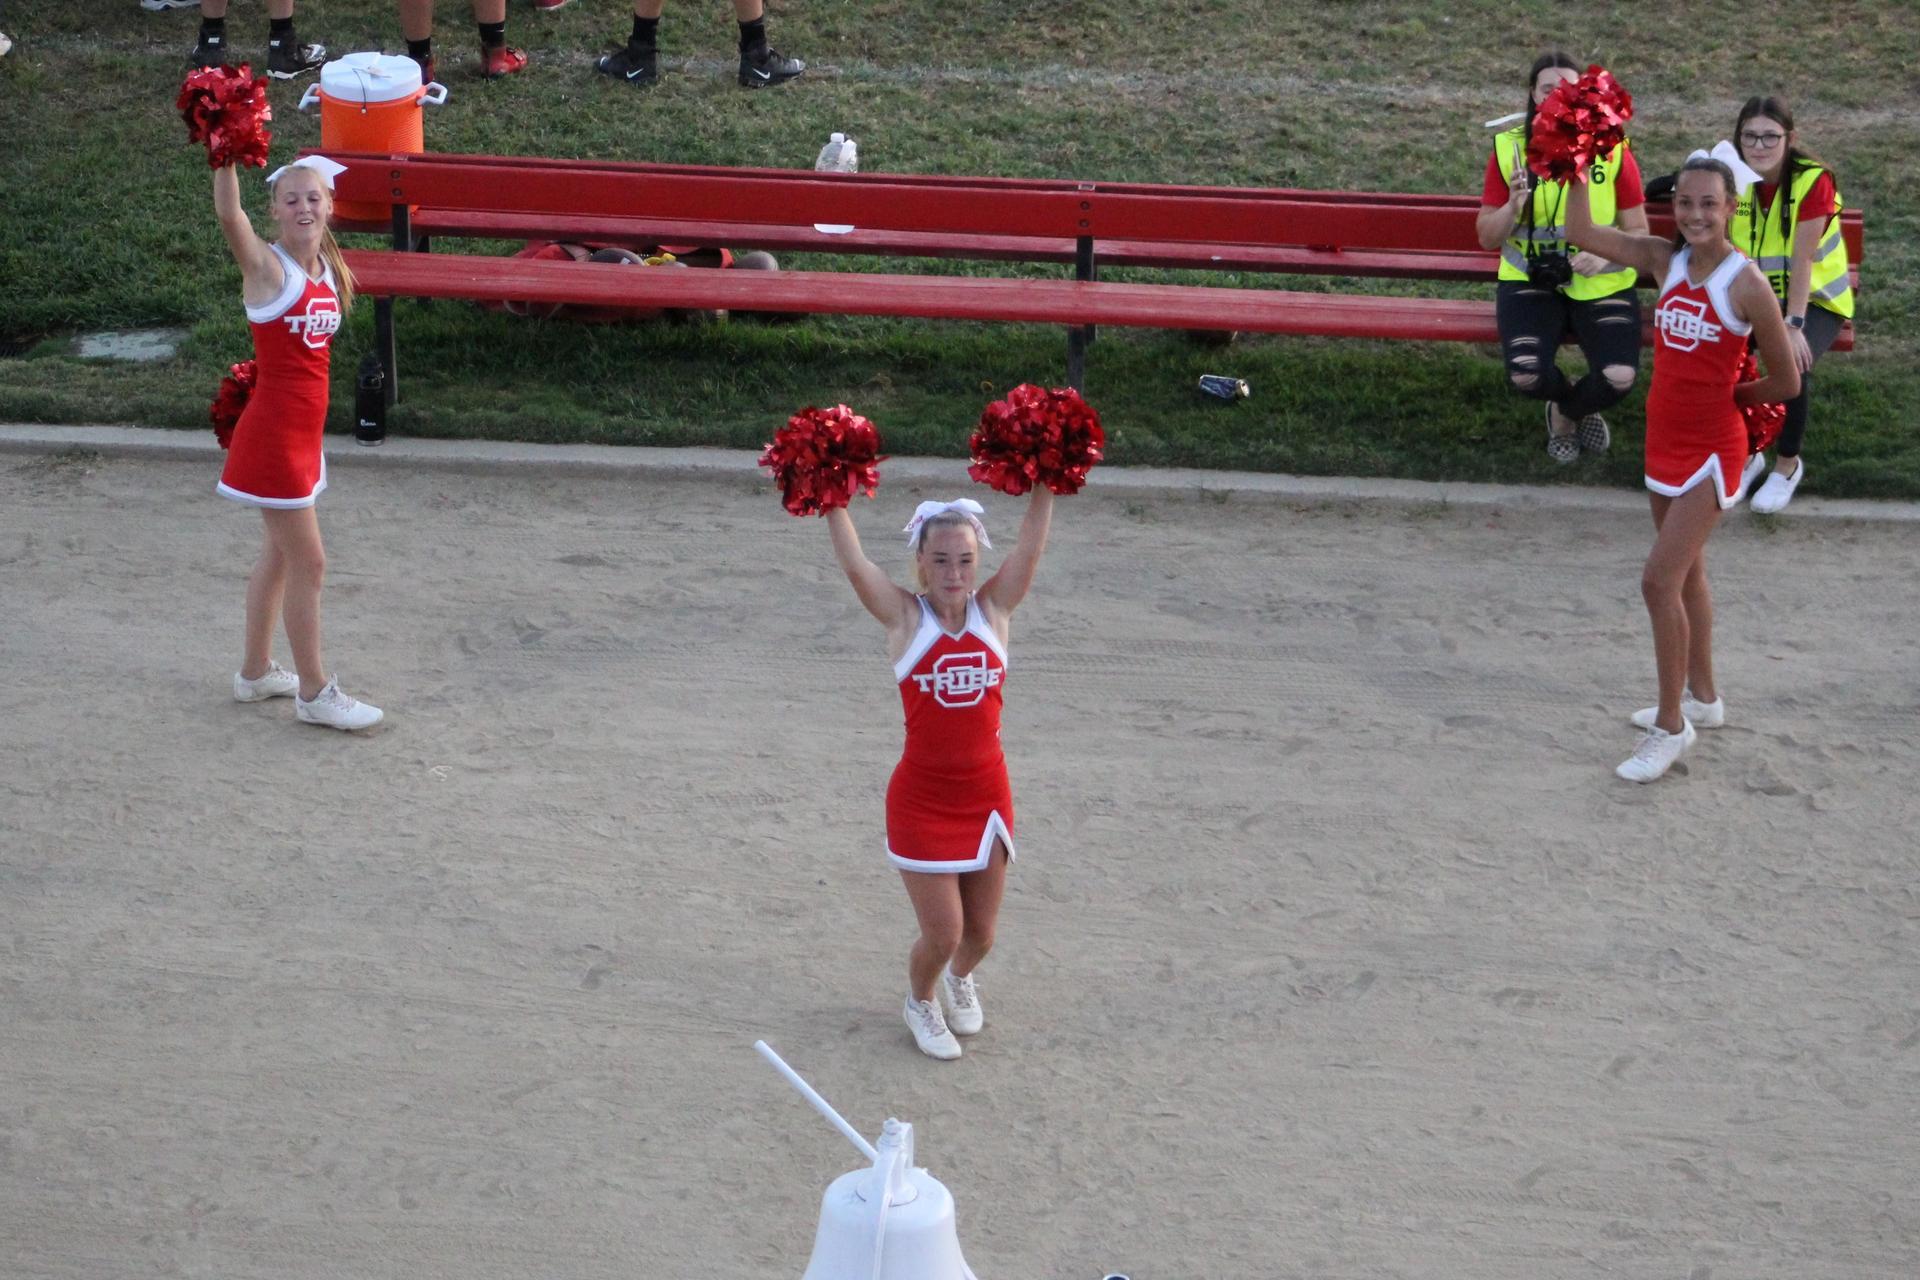 Junior Varsity Cheer in action at the Mendota football game